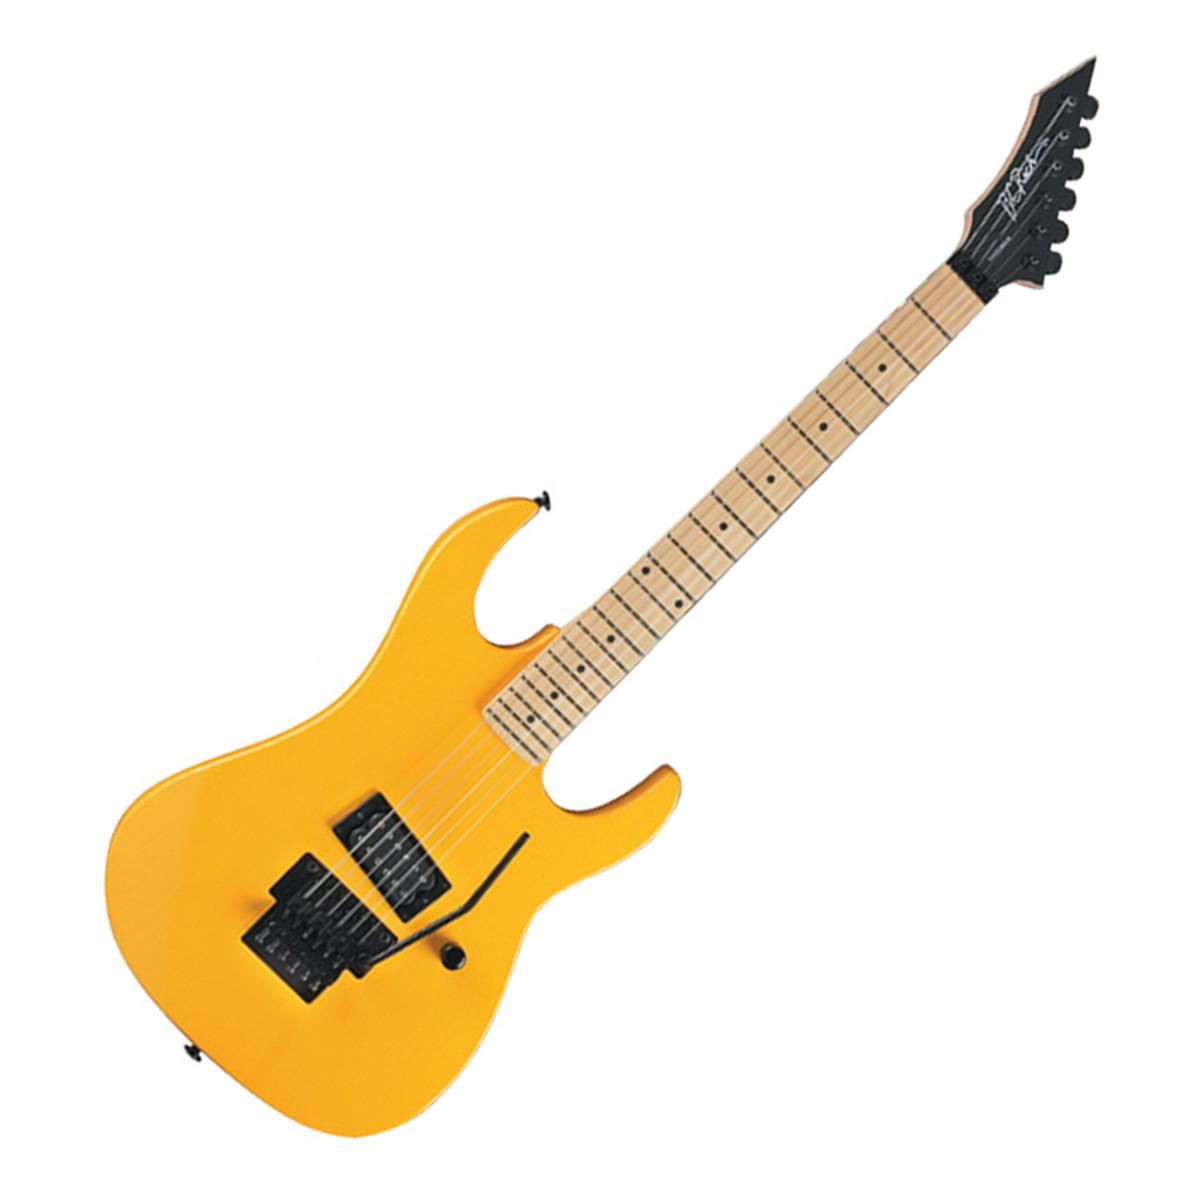 disc bc rich gunslinger retro guitar yellow at. Black Bedroom Furniture Sets. Home Design Ideas